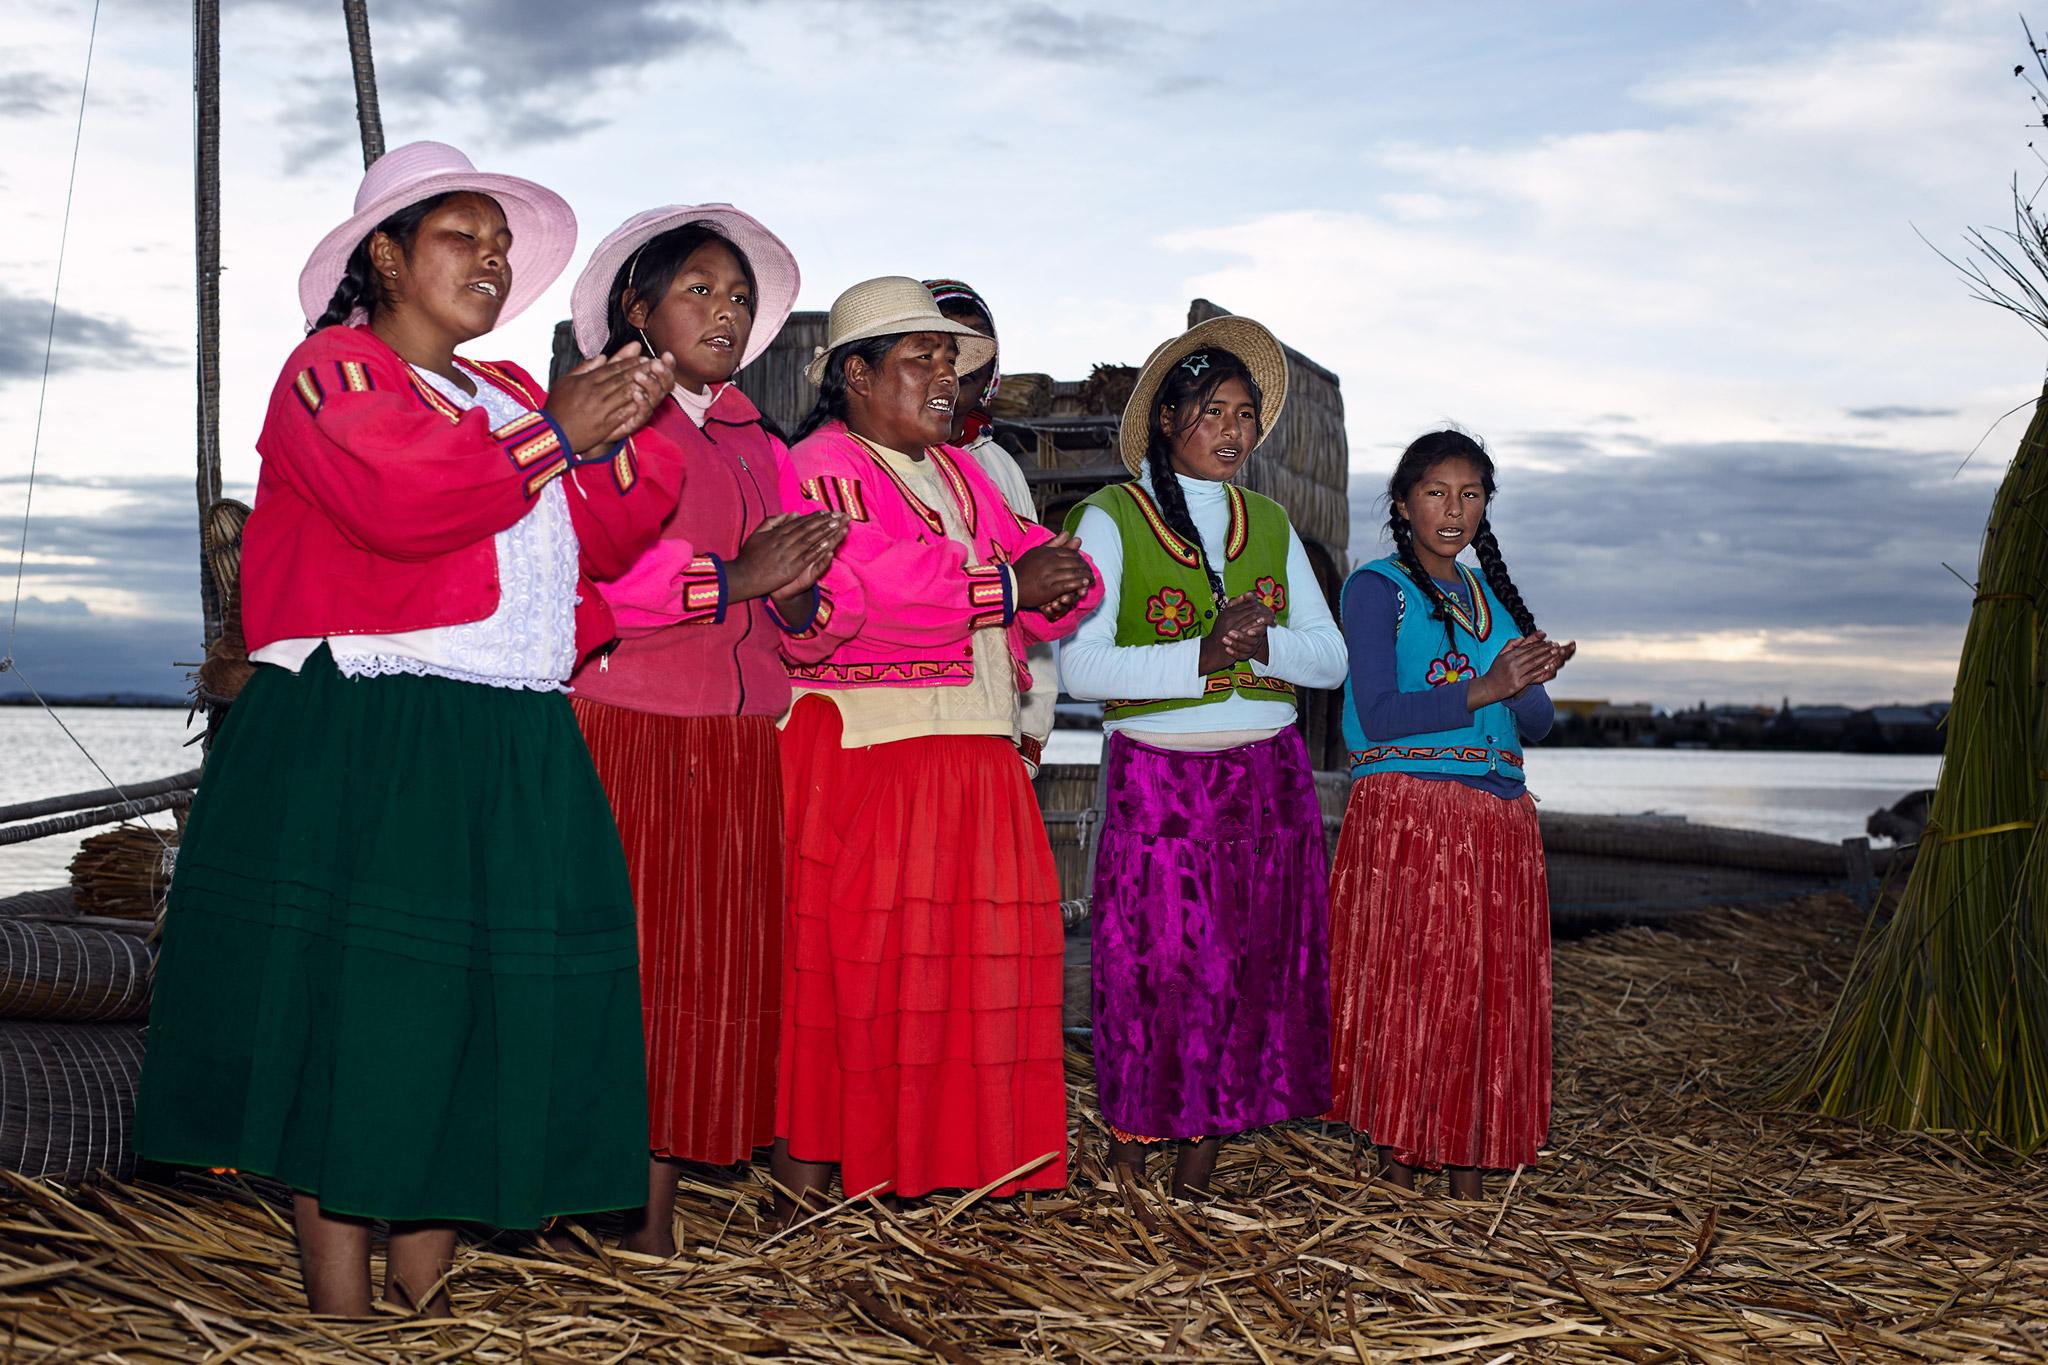 THE GIRLS FROM UROS ISLAND, TITICACA LACE, PERU